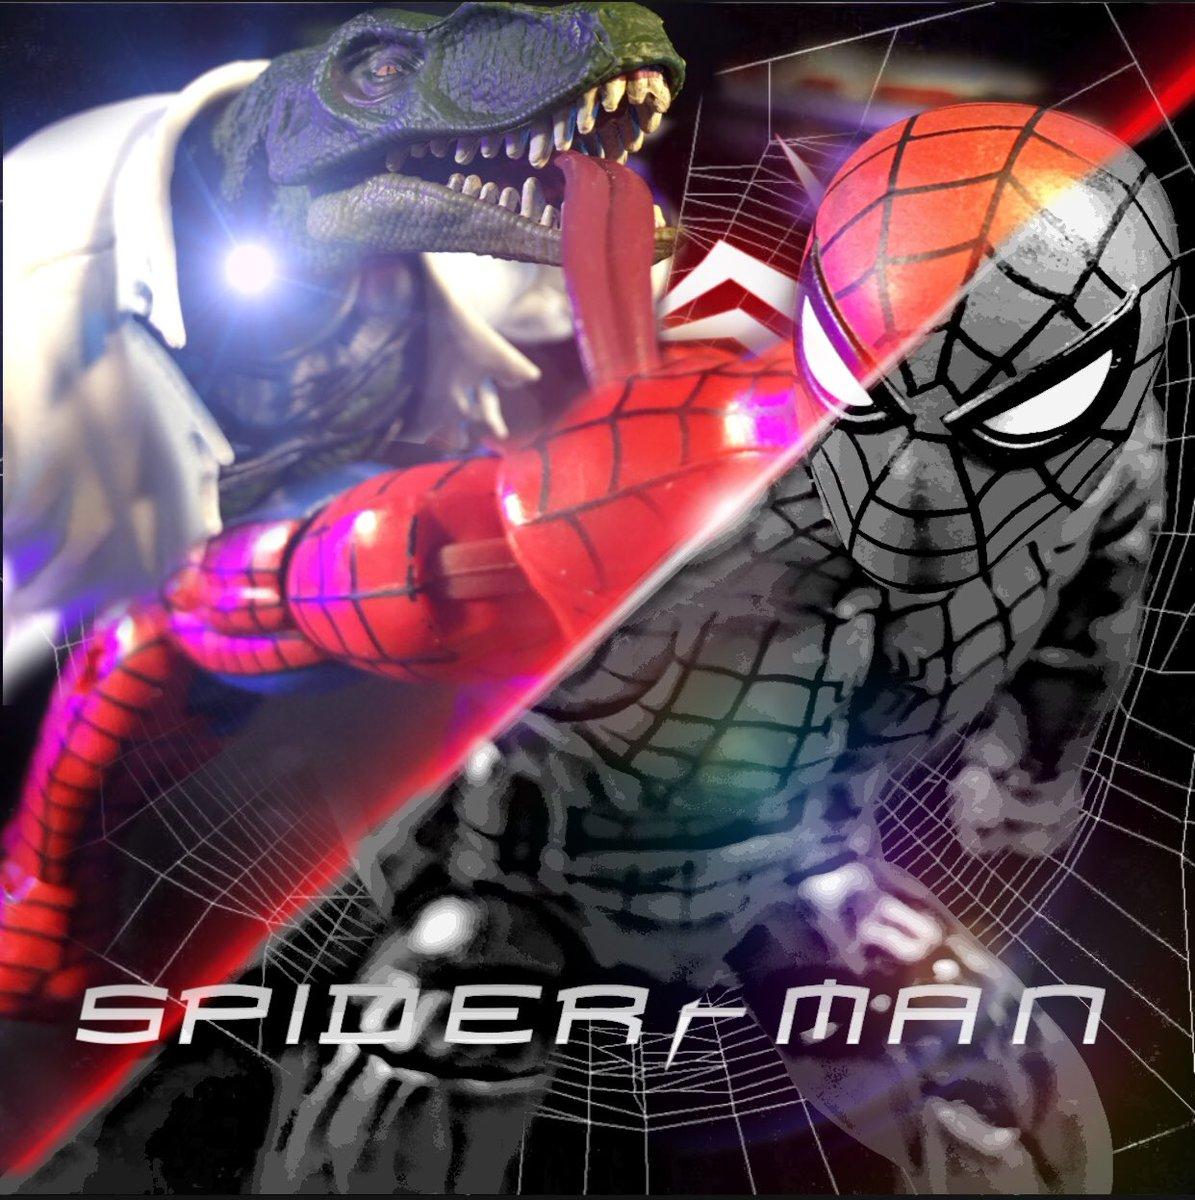 Working on some photos! #spiderman #TheBachelor #SpiderMan3 #MilesMorales #stopmotion #anime #animation #stopmotion #youtube #youtuber #SpiderMan3 #PS5 #XboxSeriesS #legos #cobrakai #Netflix #Disneyland #actor #DisneyPlus #PixarSoul #MCU #actress